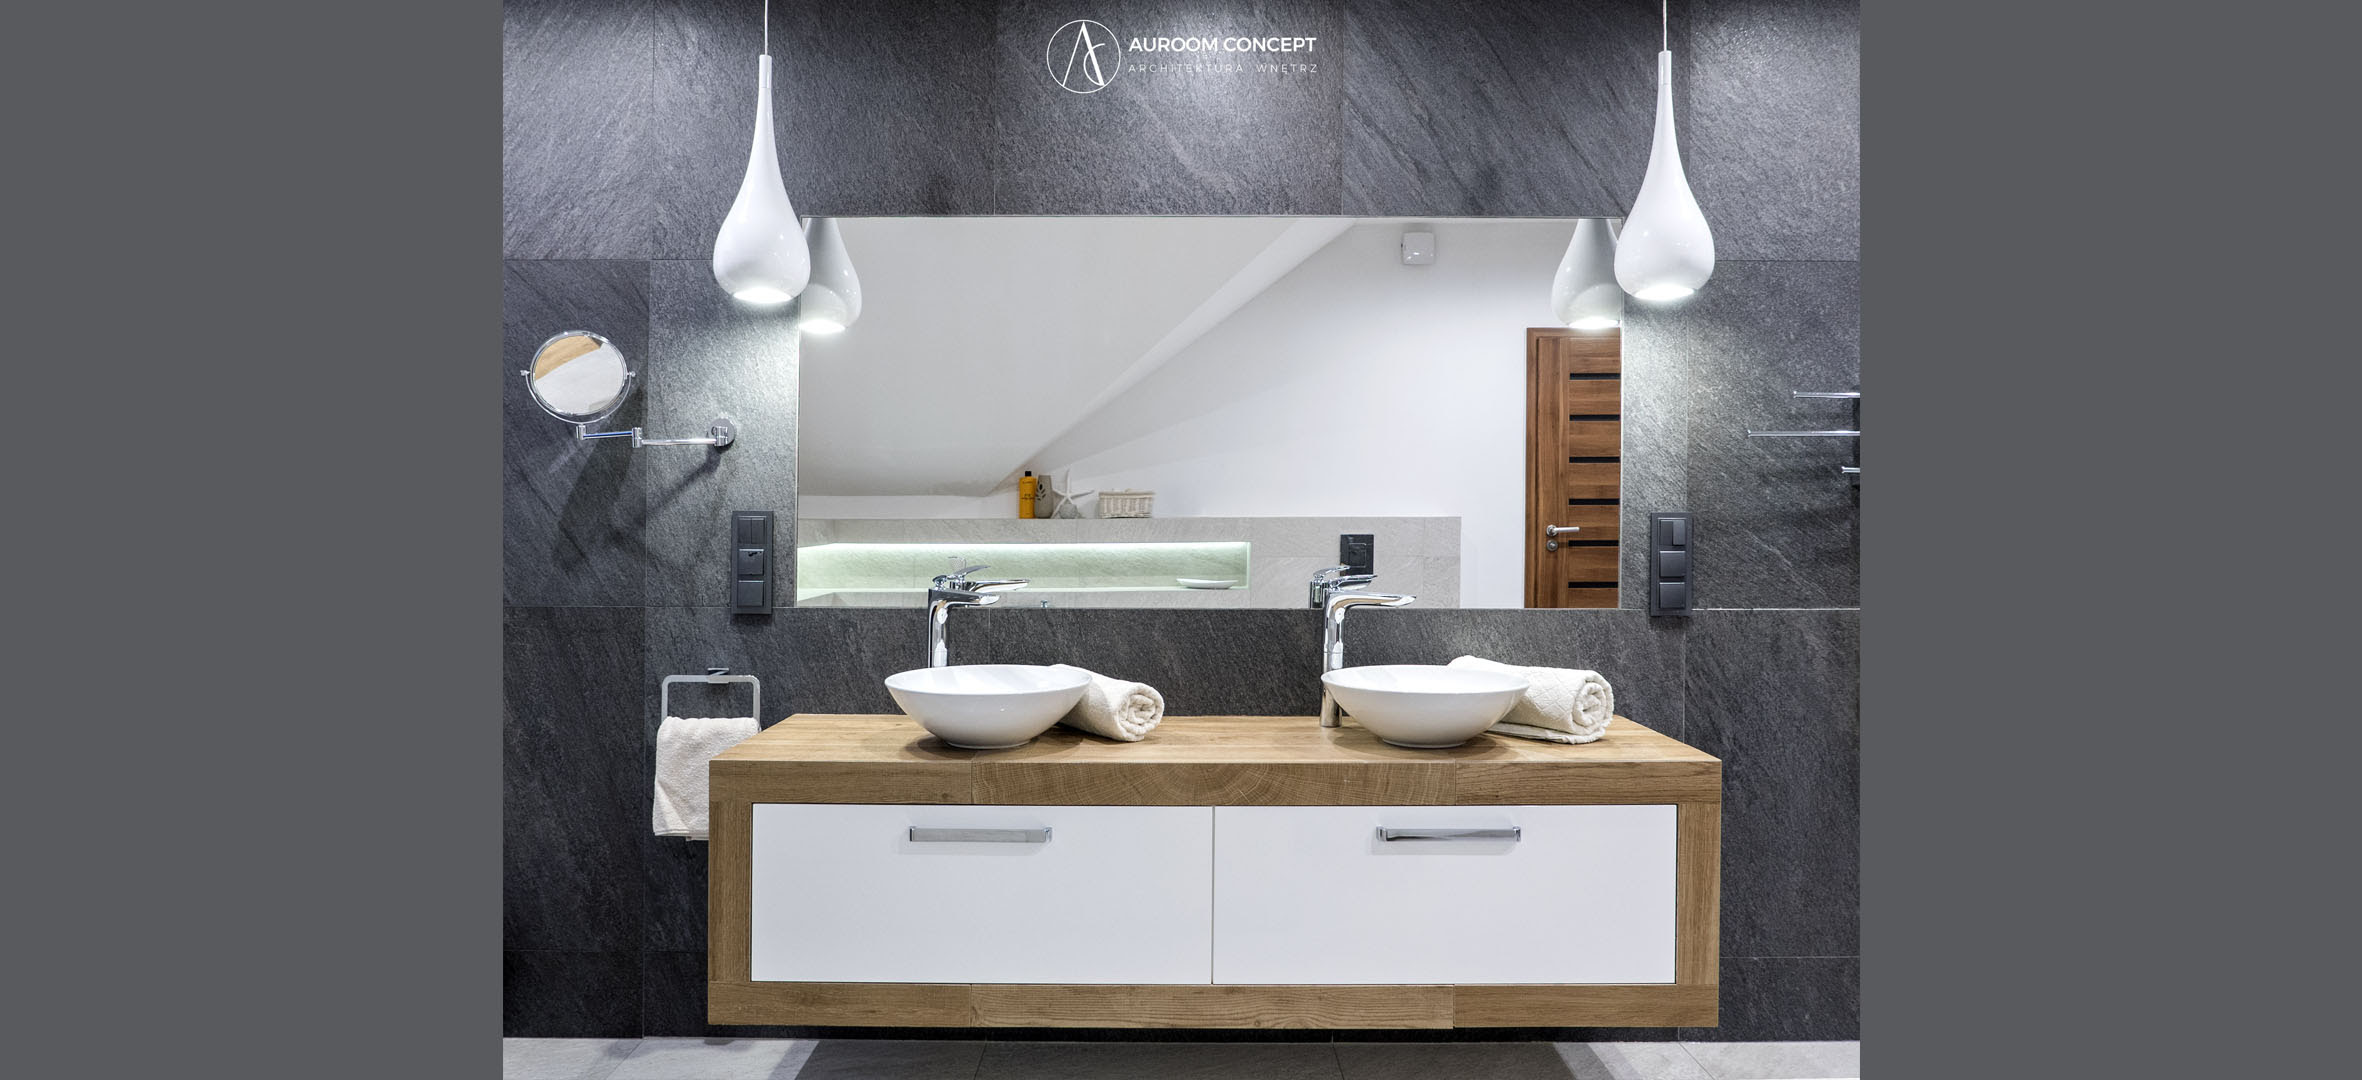 Łazienka Siemianowice | Auroom Concept